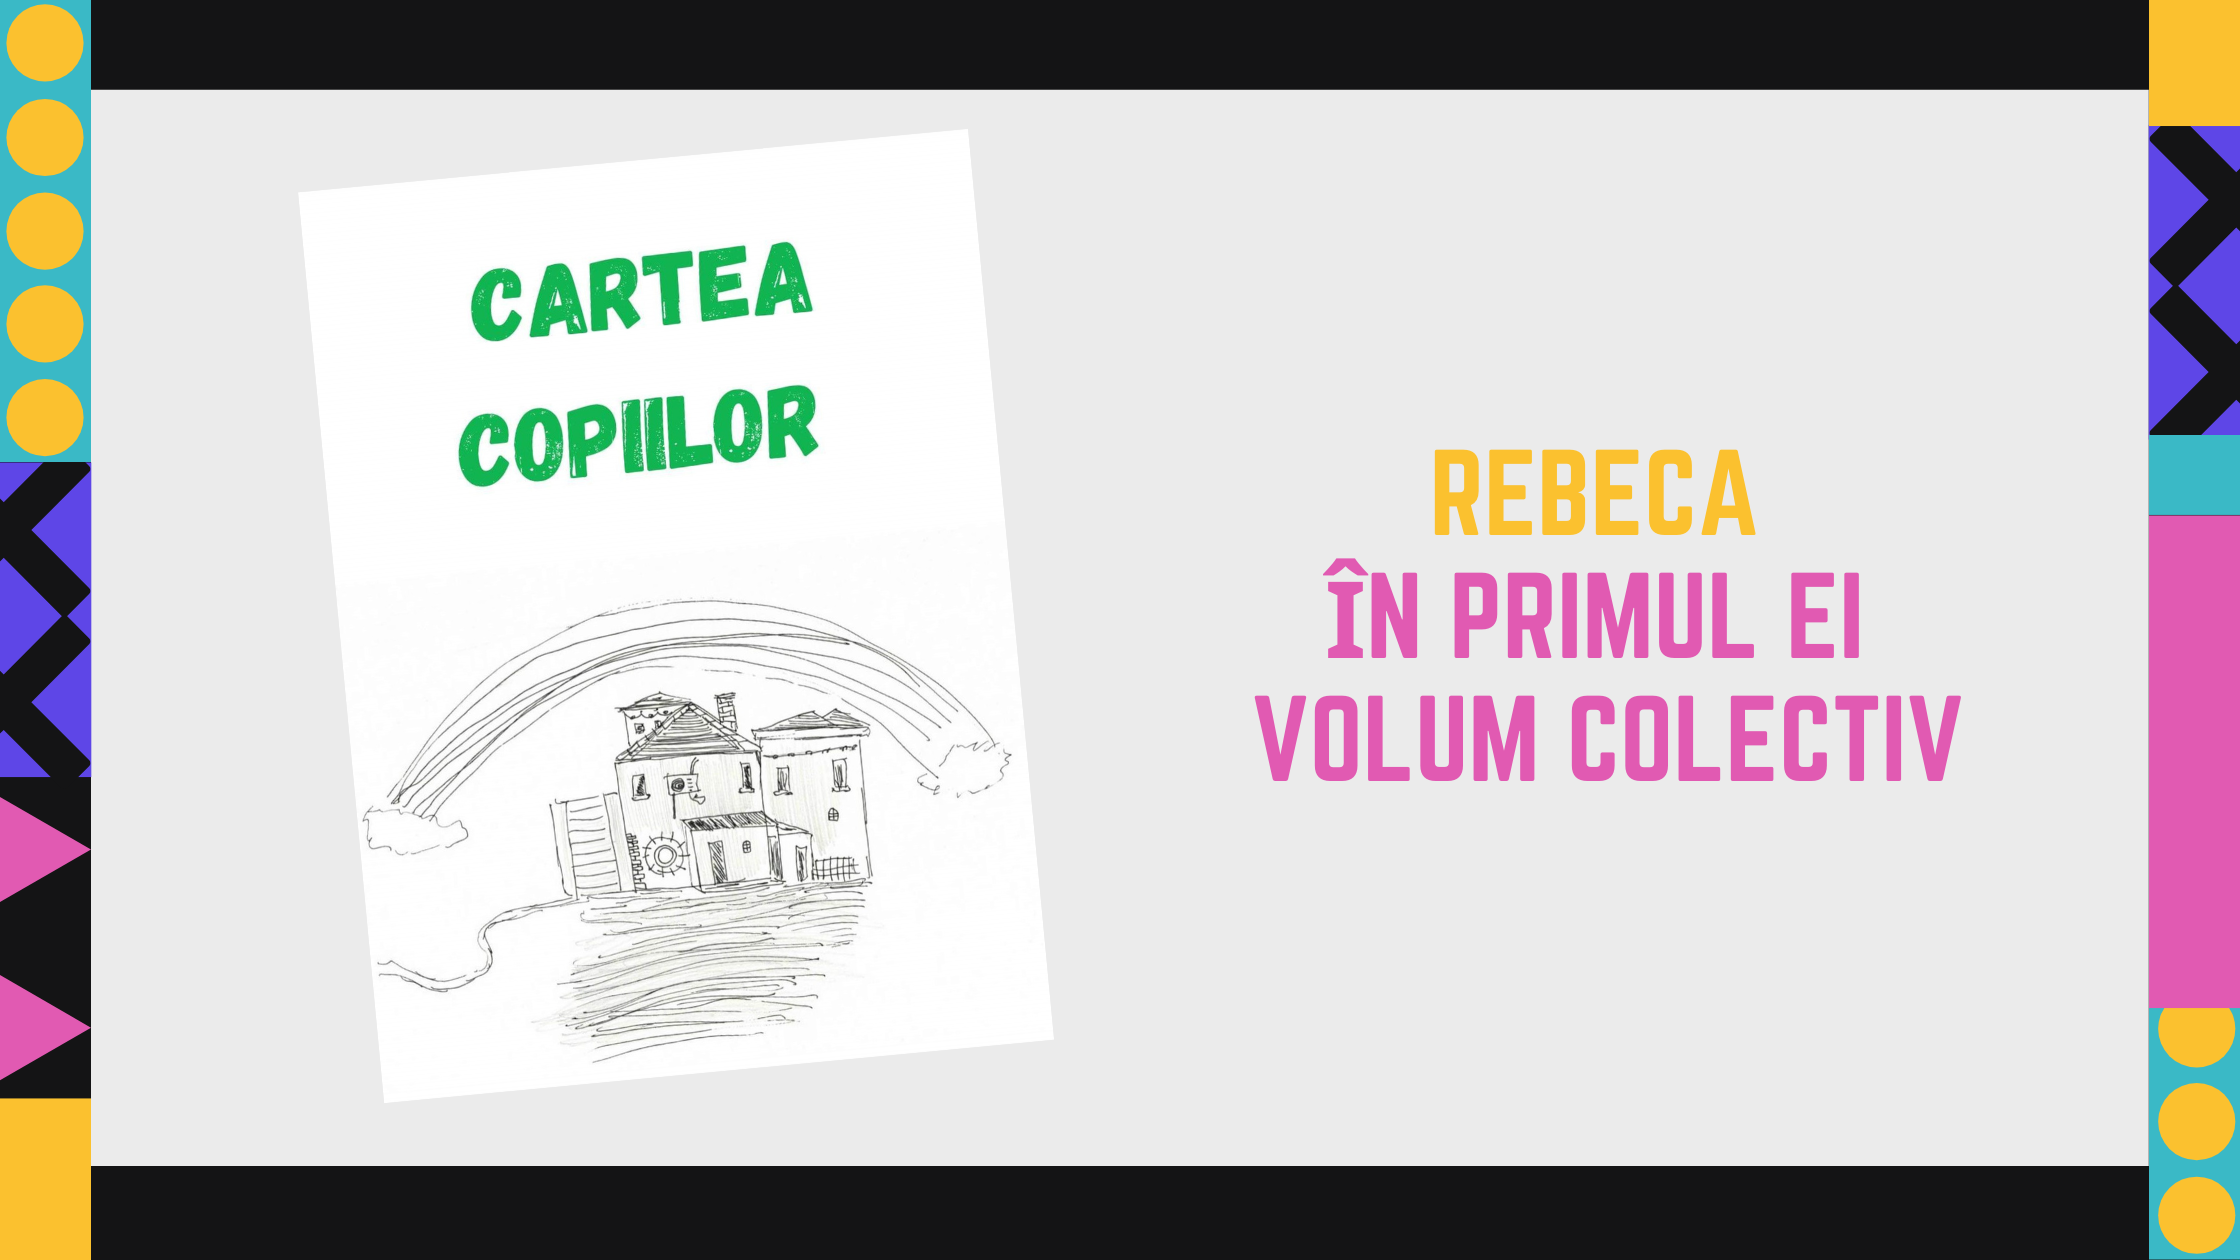 Rebeca a scos primul ei volum colectiv